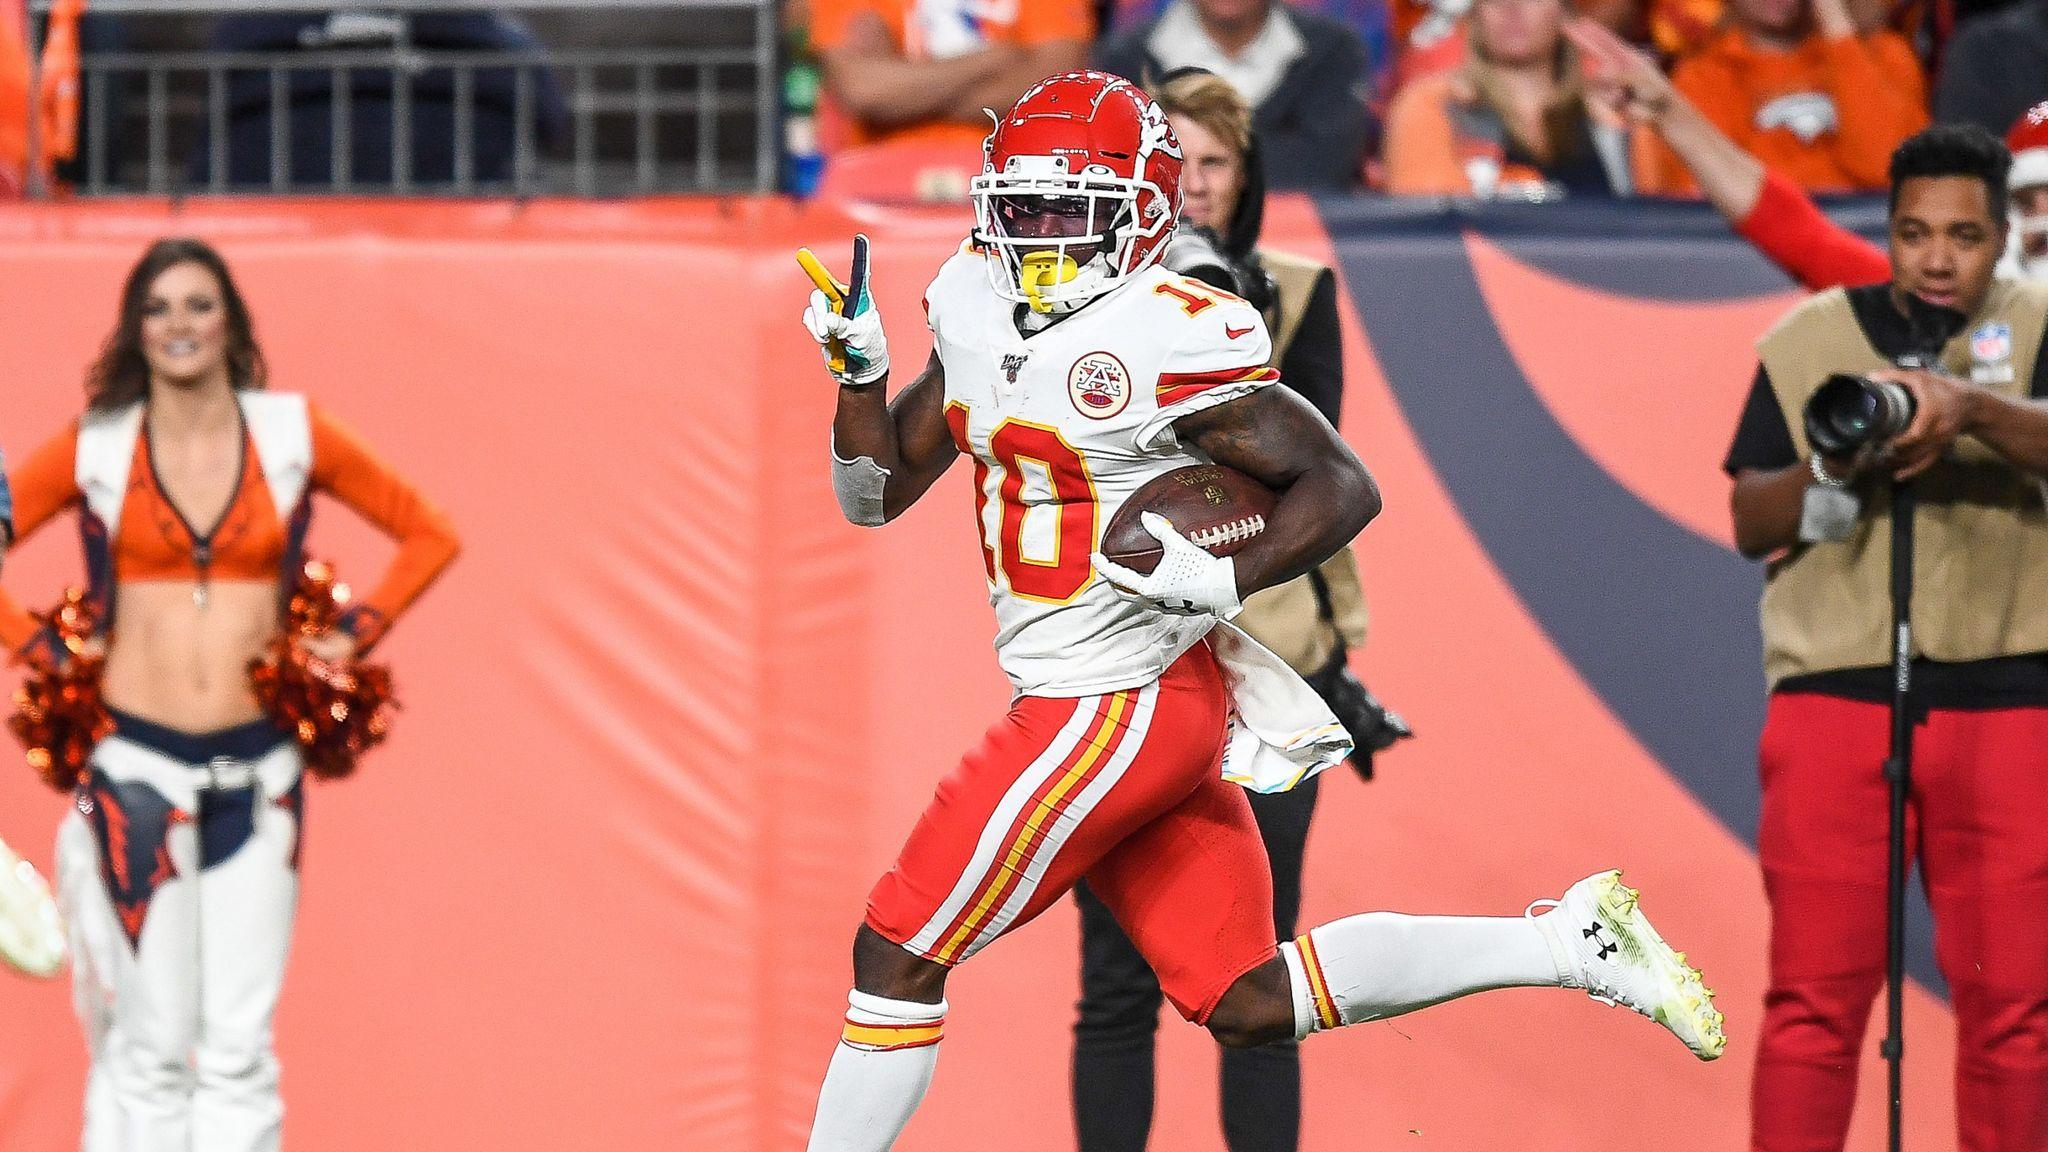 Patrick Mahomes injures knee as Kansas City Chiefs crush Denver Broncos